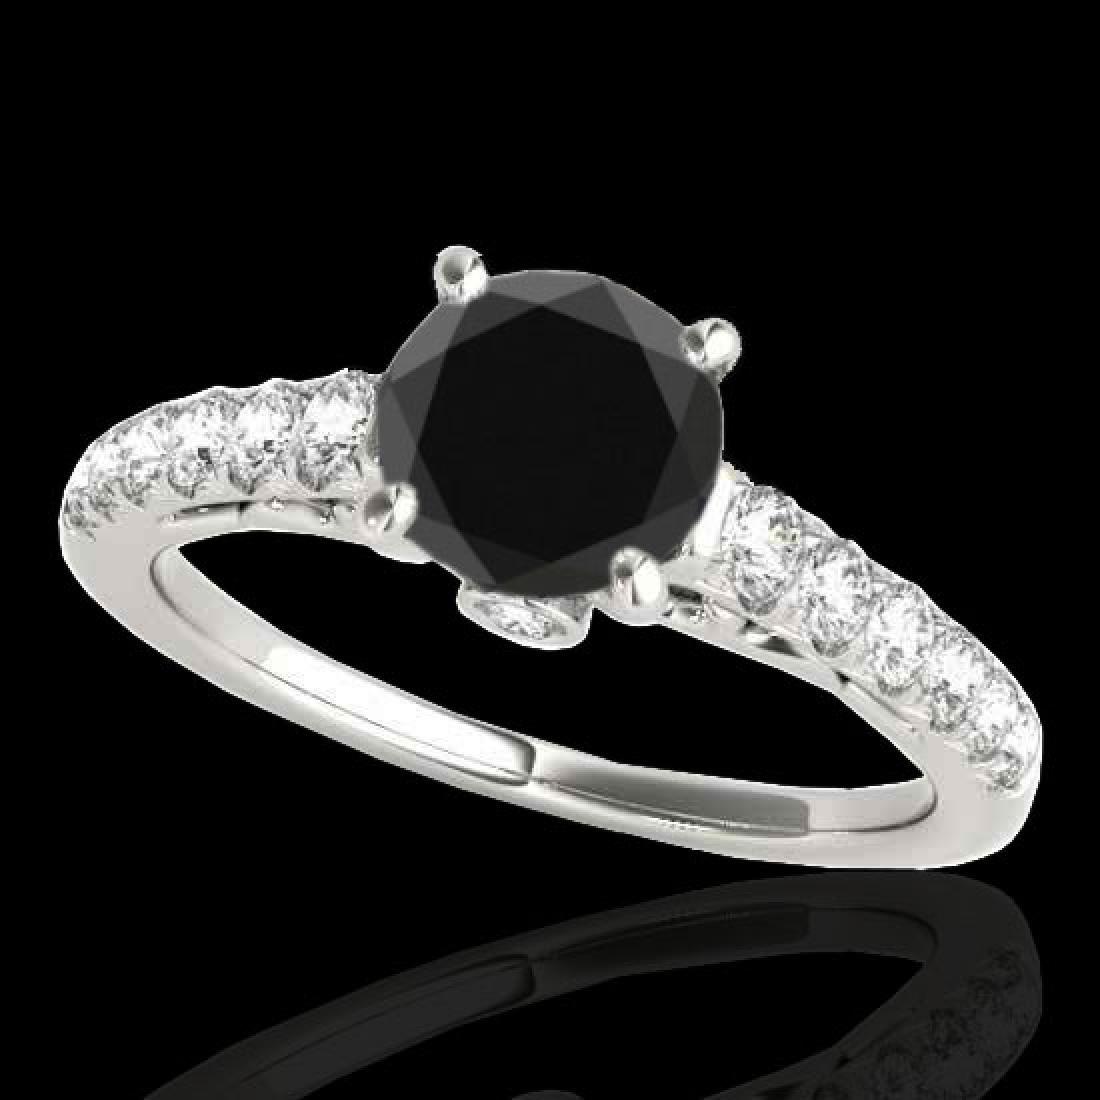 1.5 CTW Certified VS Black Diamond Solitaire Ring 10K